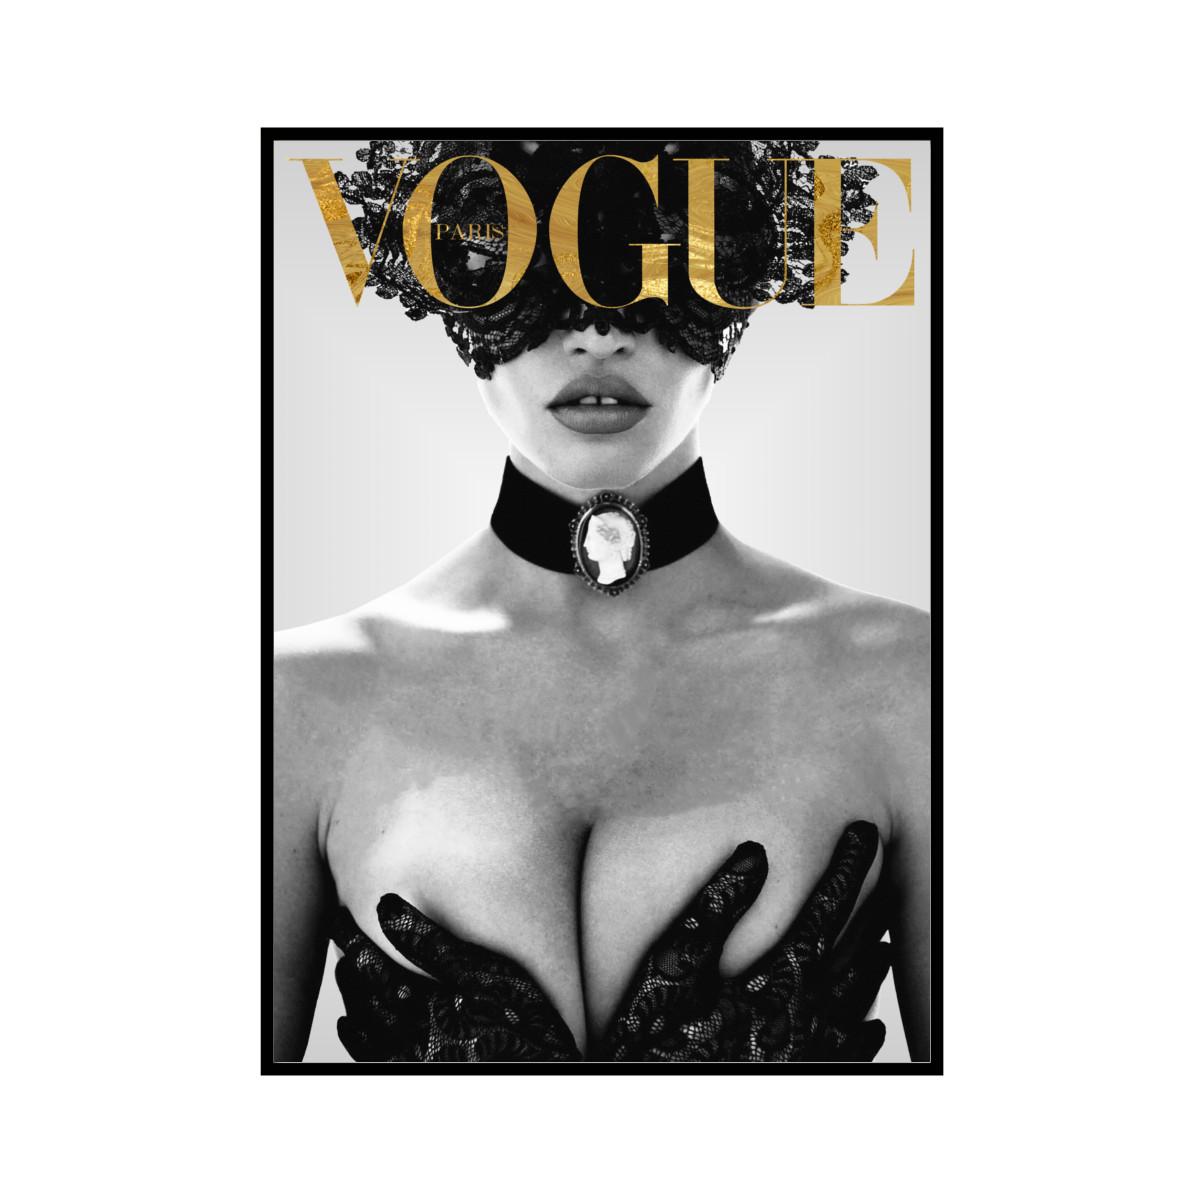 """VOGUE GM"" BG - VOGUEシリーズ [SD-000569] A4サイズ ポスター単品"